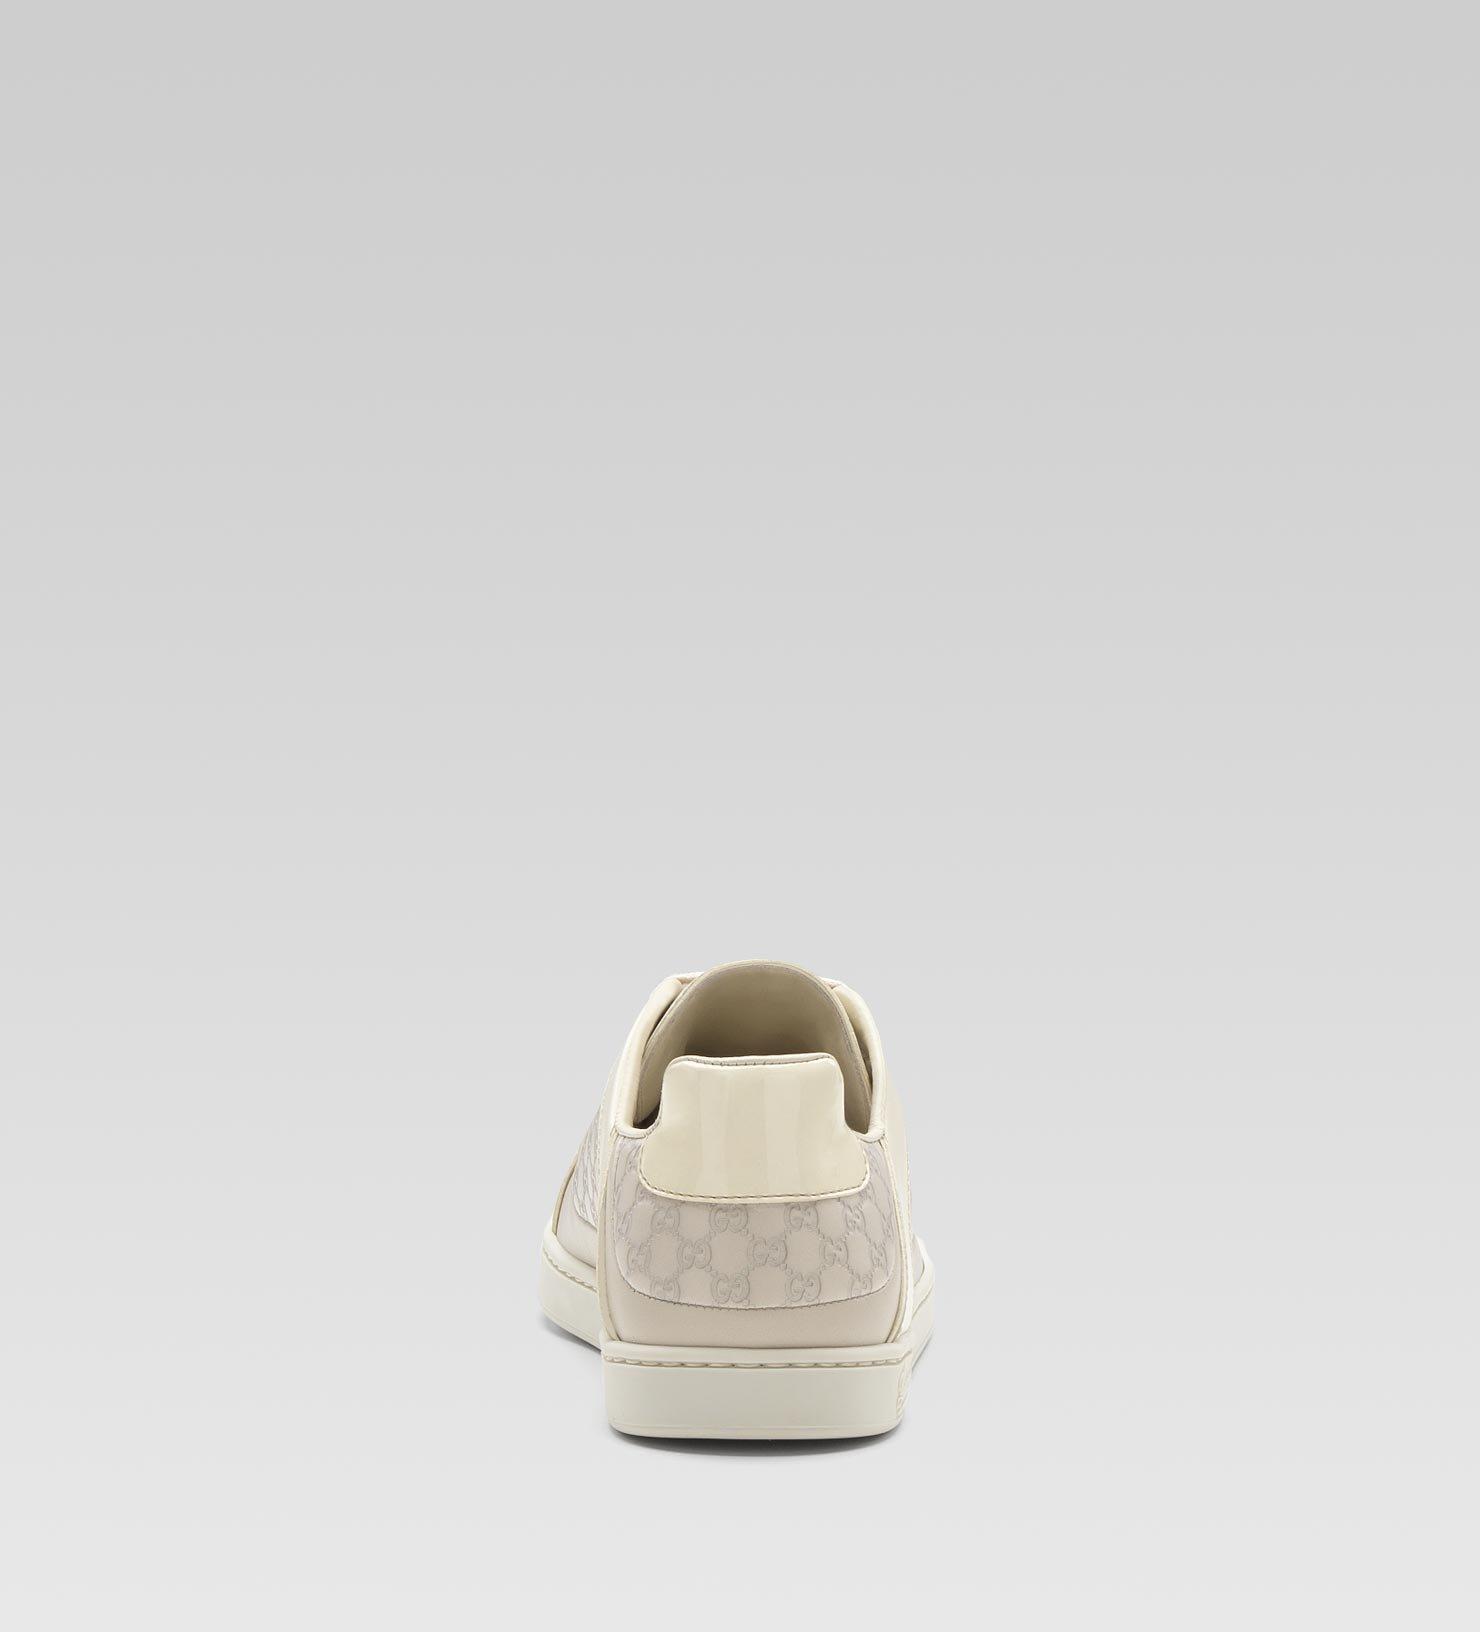 7100274d6 Gucci Coda Pop Low Laceup Sneaker in White - Lyst